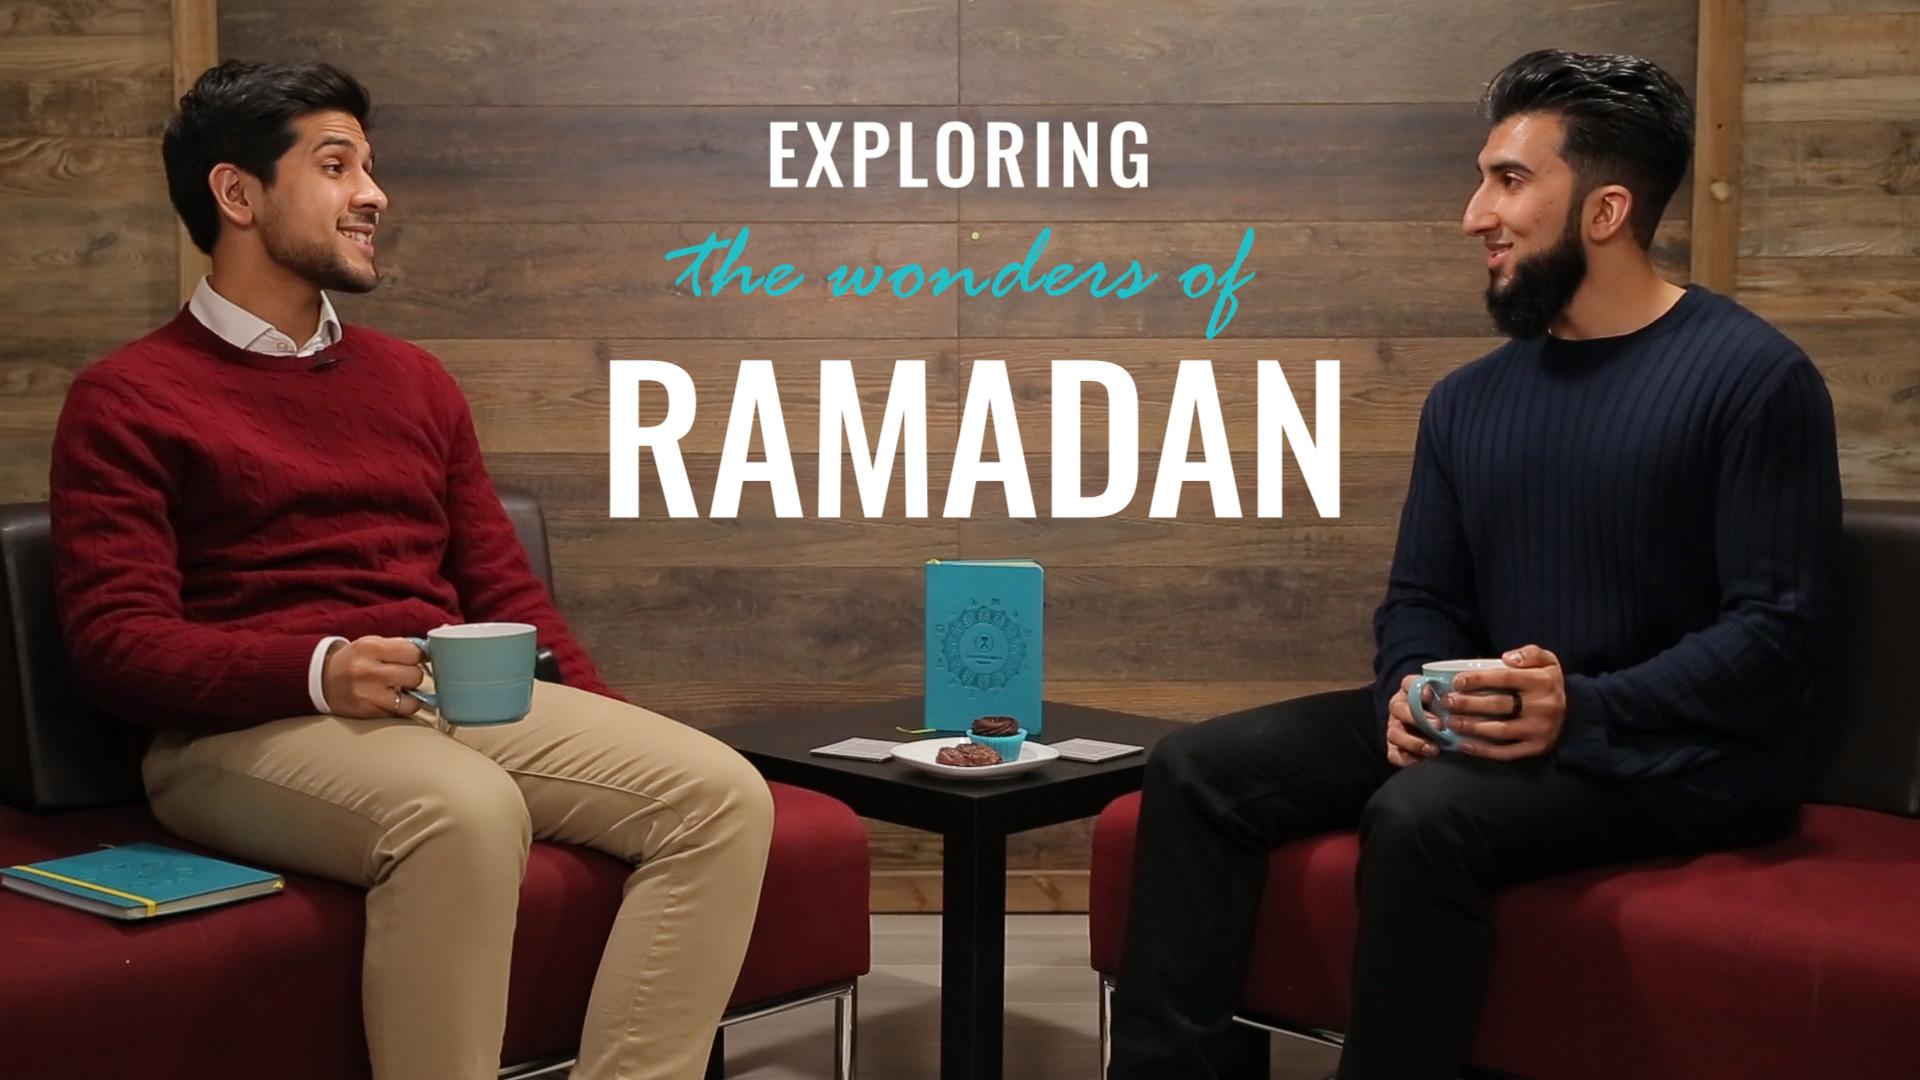 Shahbaz Ramadan Main Thumbnail